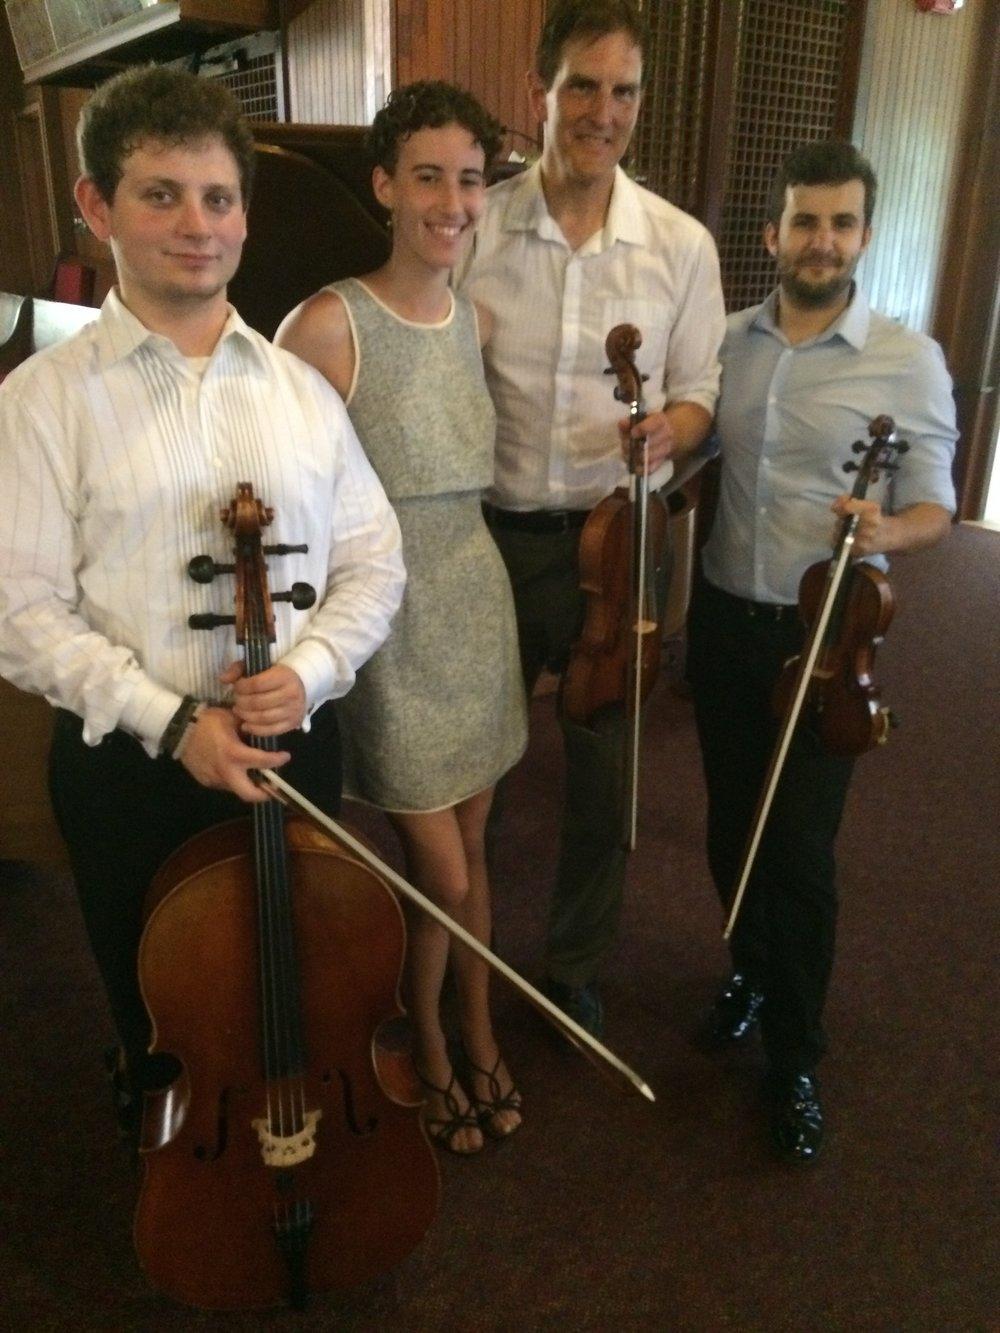 Faure piano quartet pic.JPG